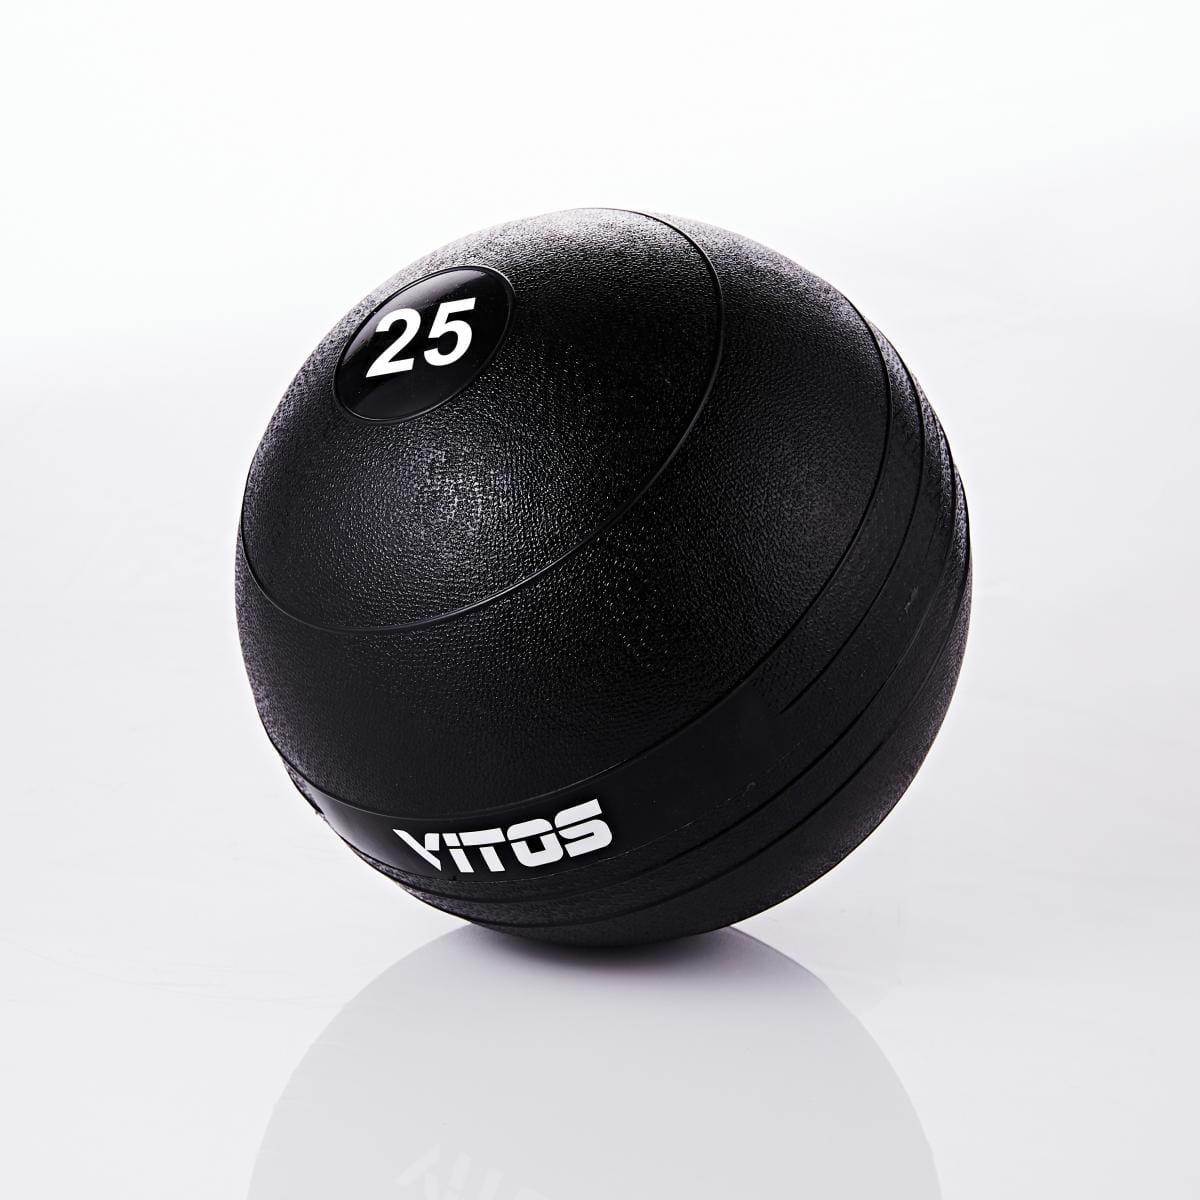 VITOS 重力球 25磅 11公斤 0